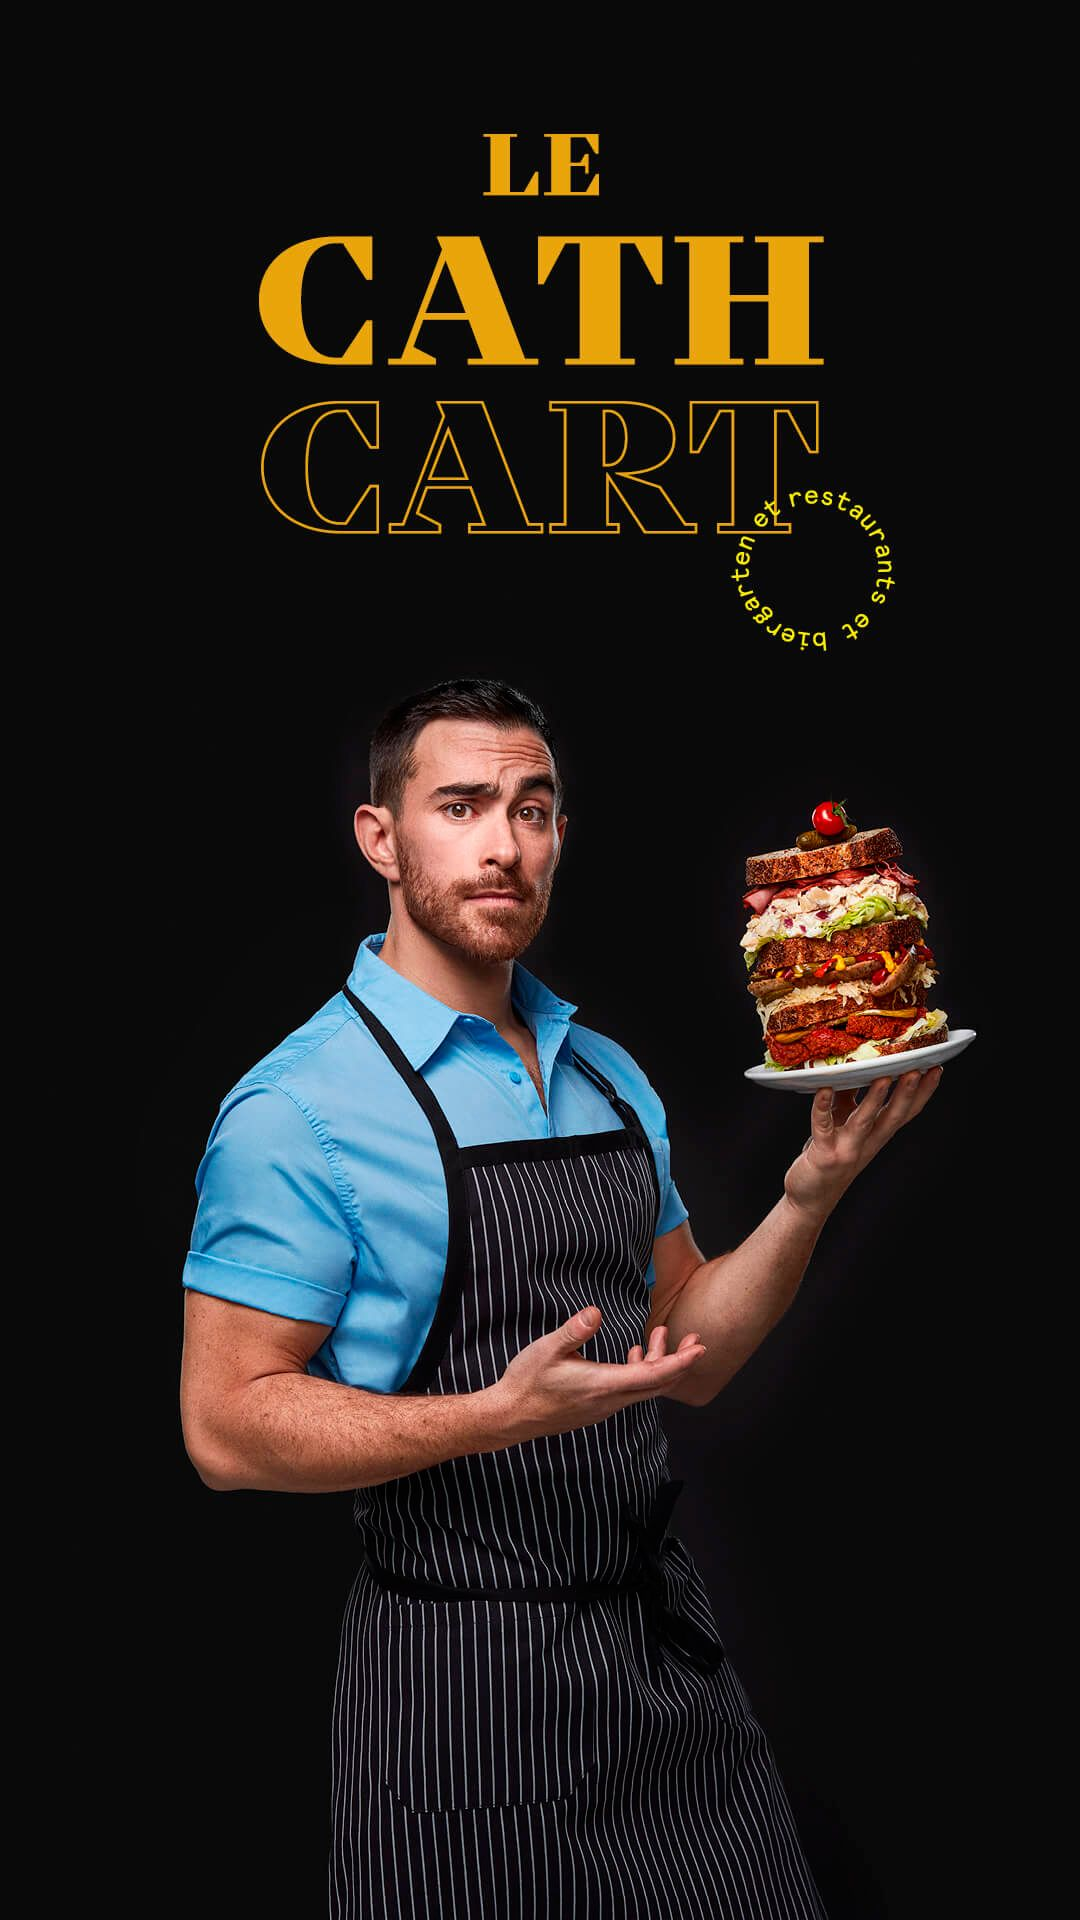 Alexandre Cohen by Jocelyn Michel for Cathcart restaurant